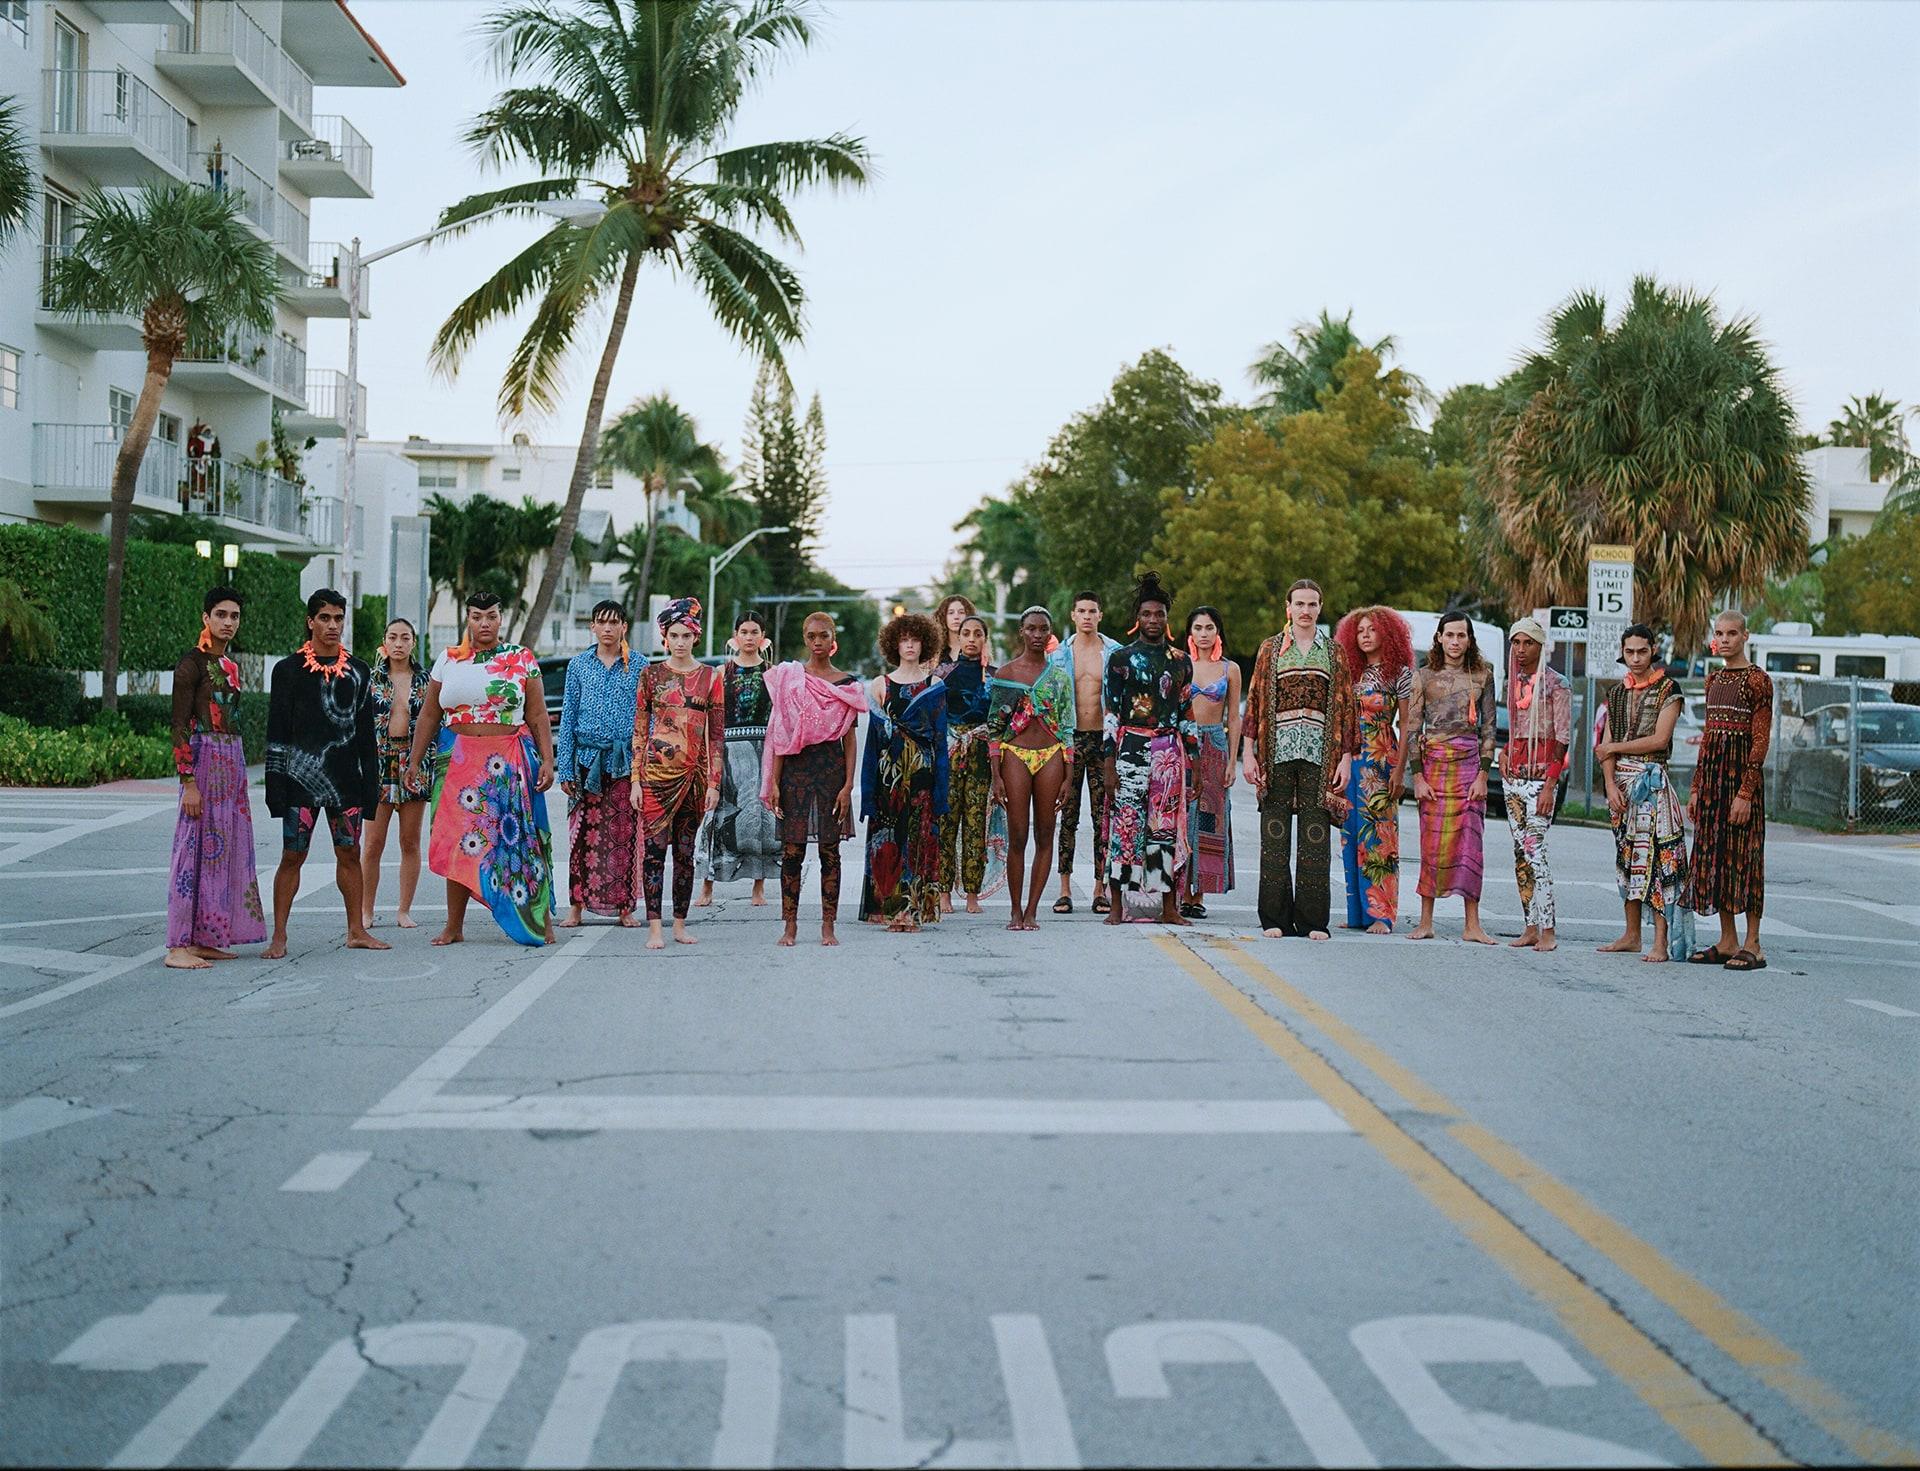 Desigual x Art Basel<br> Summer 2020 Campaign